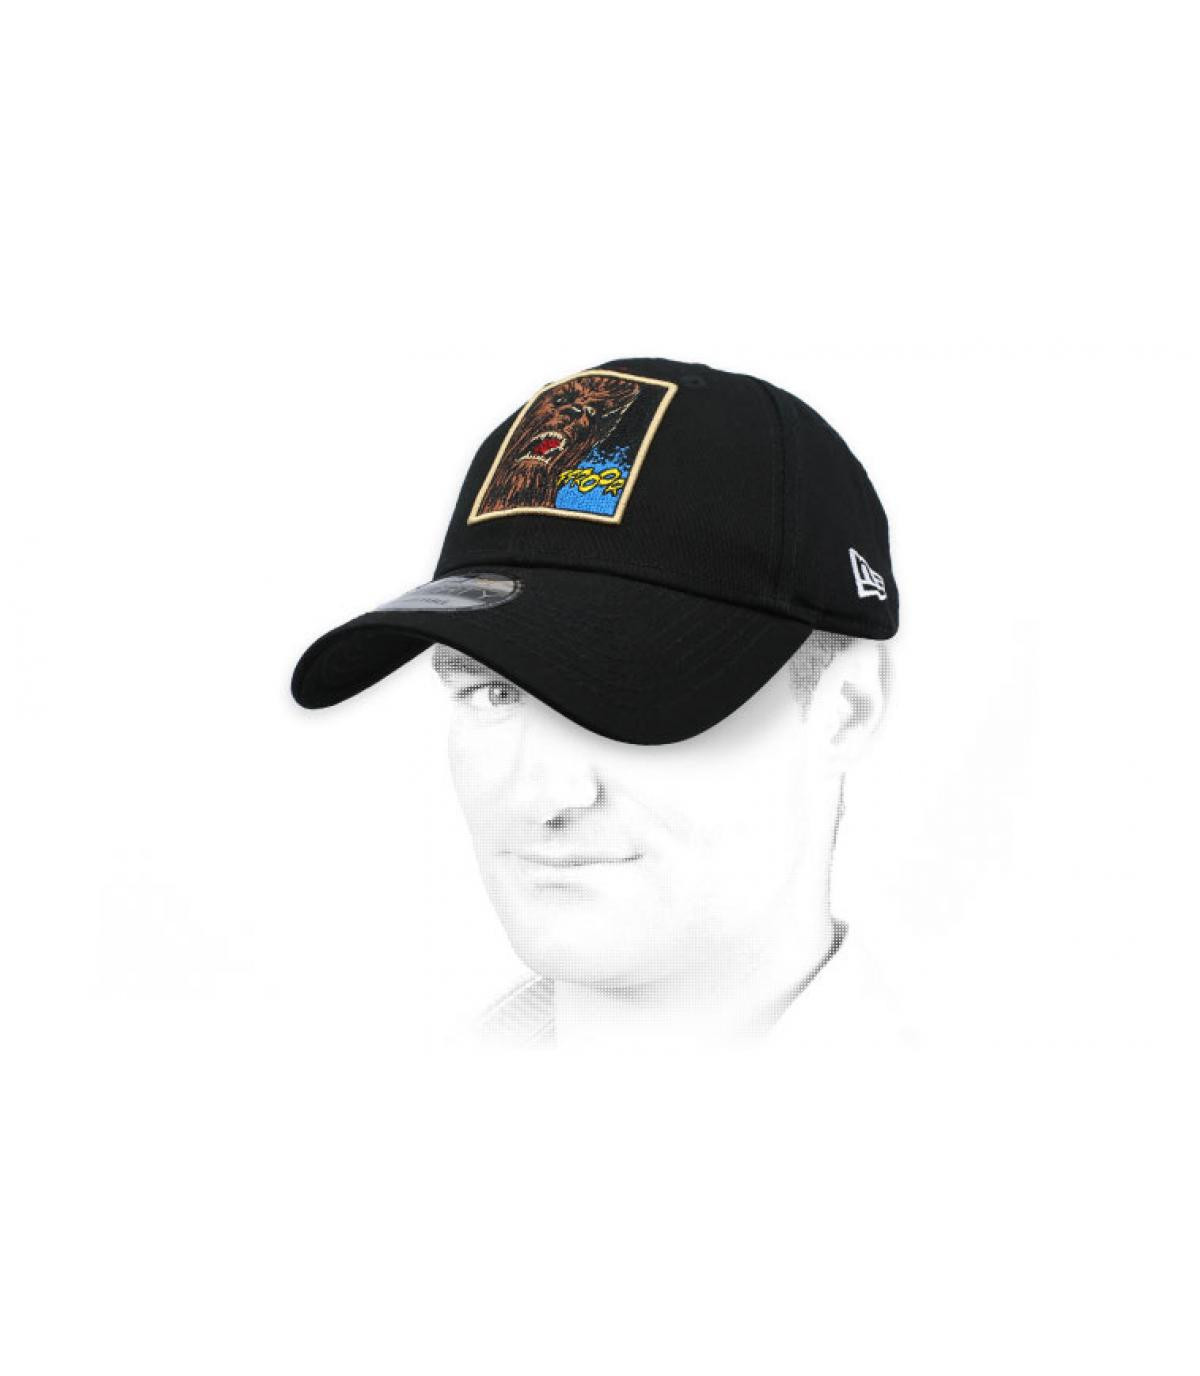 Cap Chewbacca schwarz